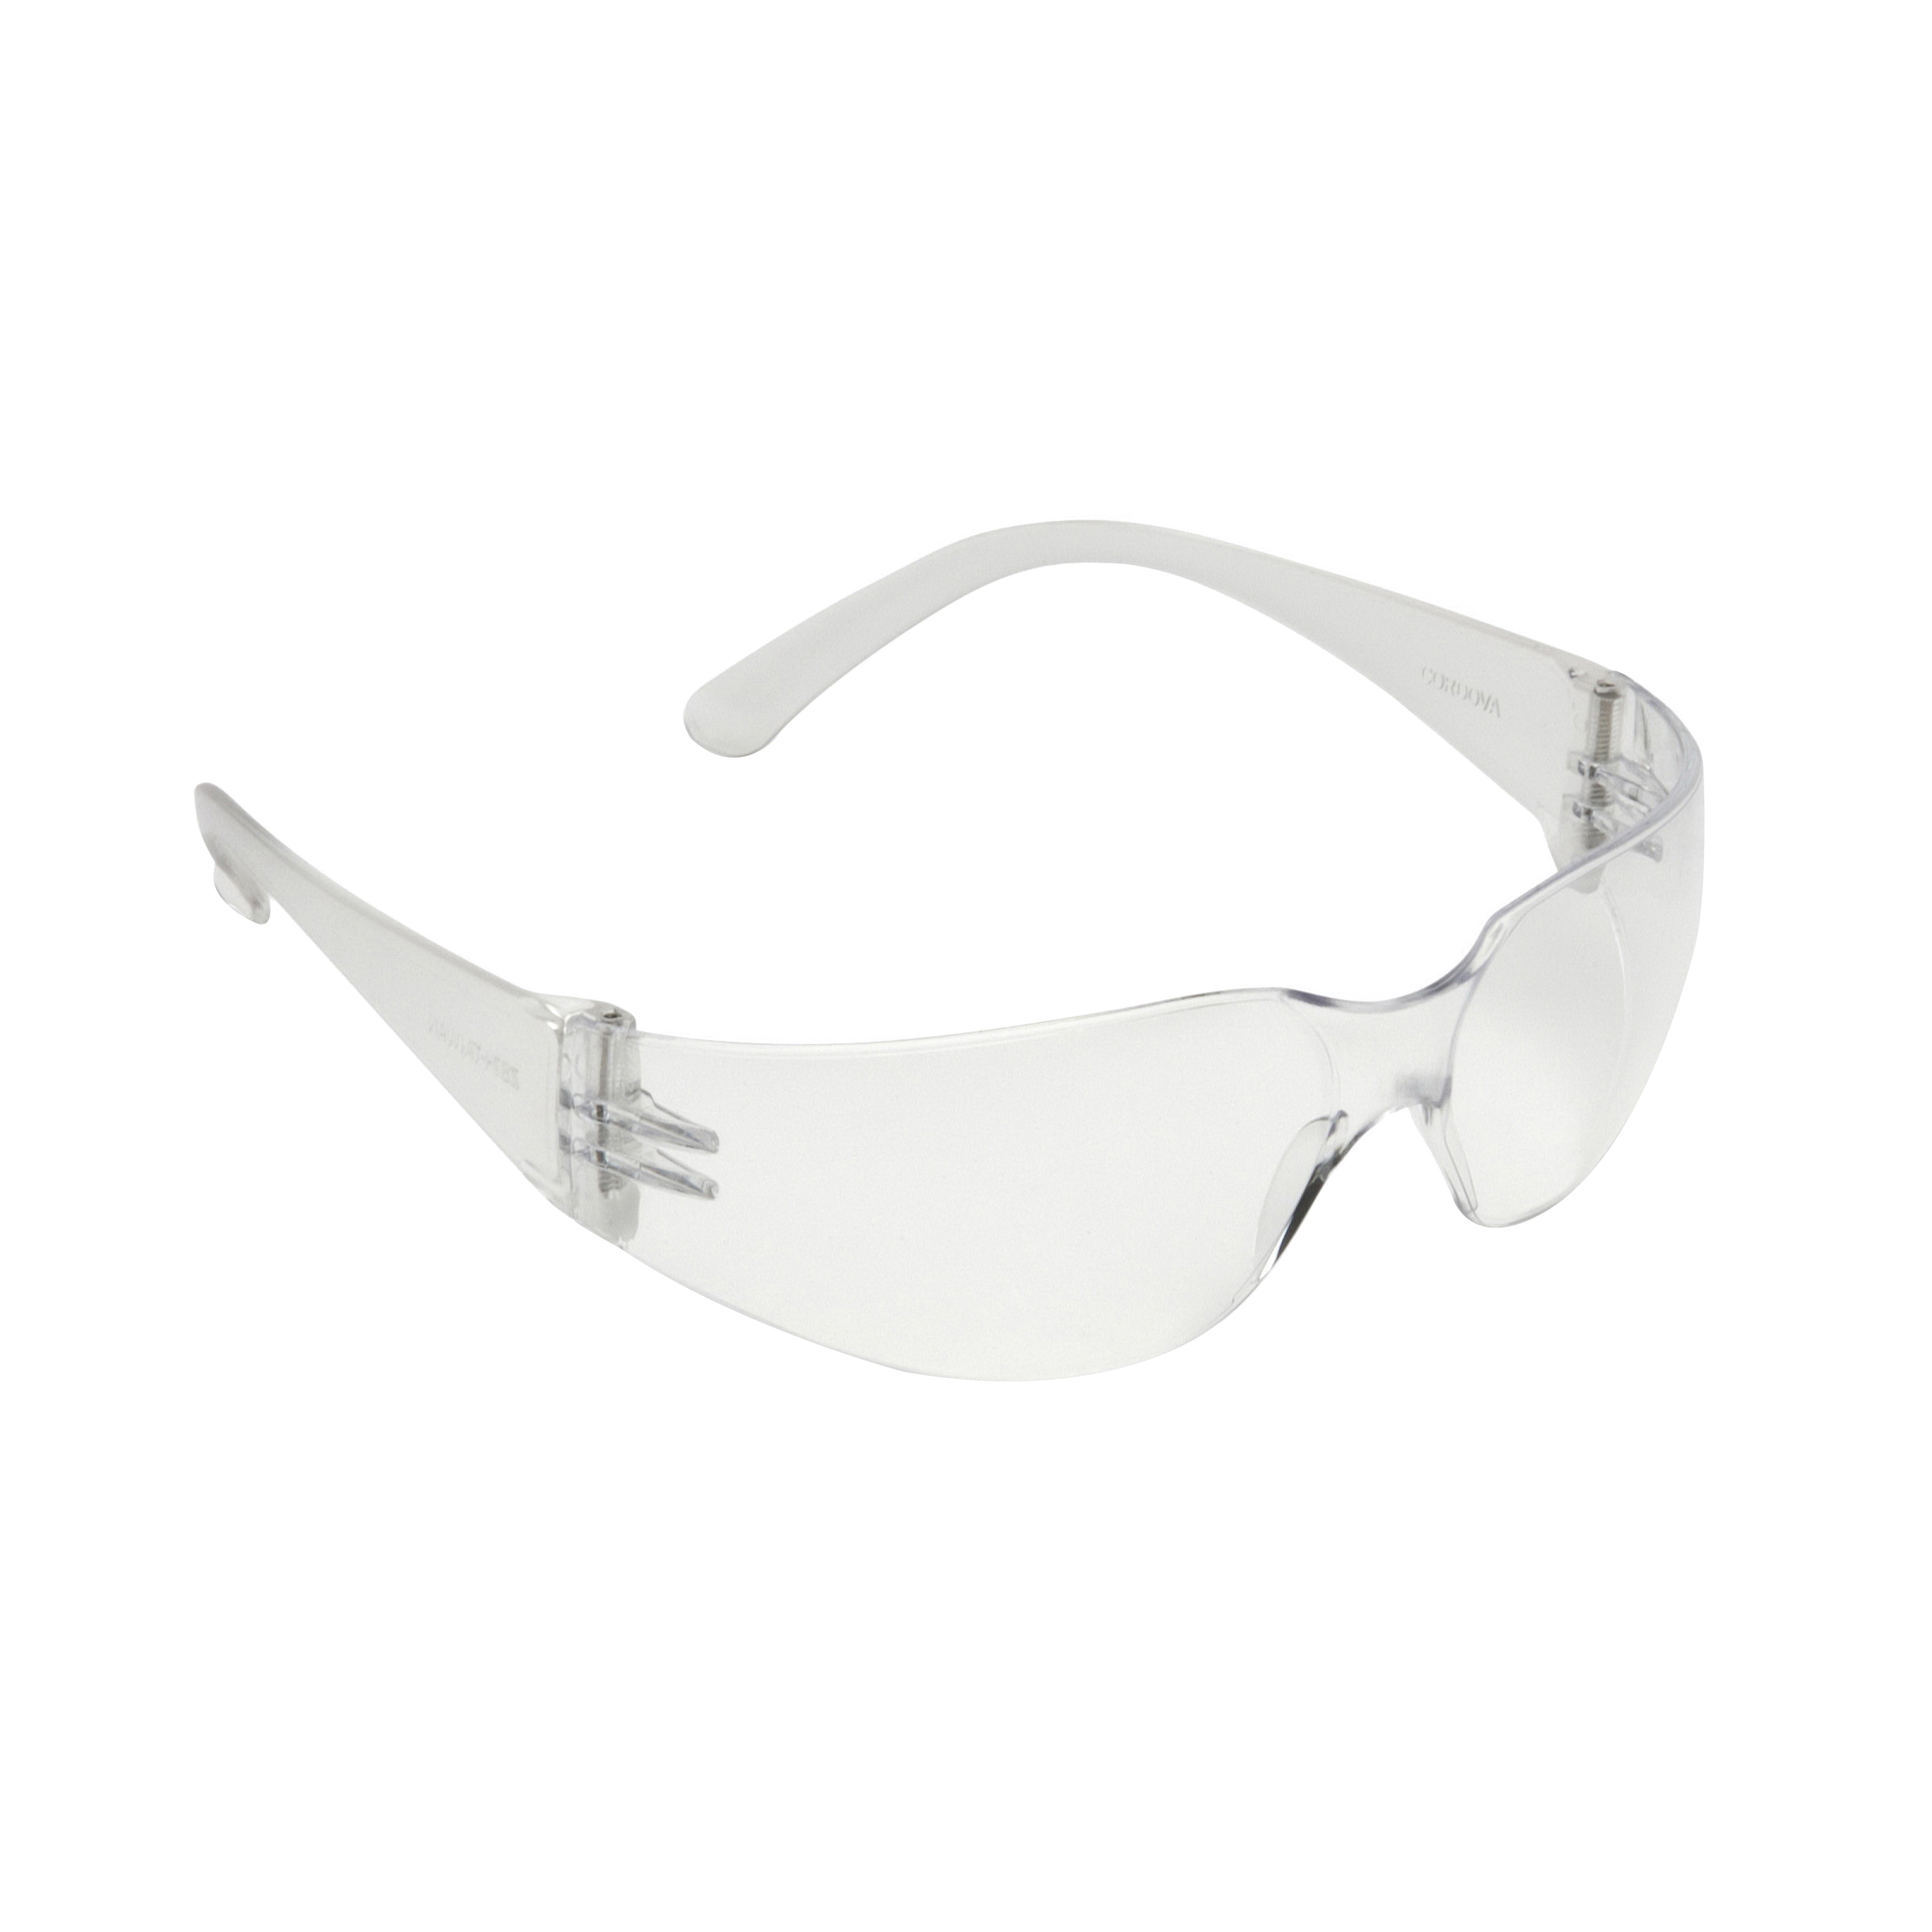 Cordova Bulldog™ Safety Glasses, Clear Temple, Clear Lens